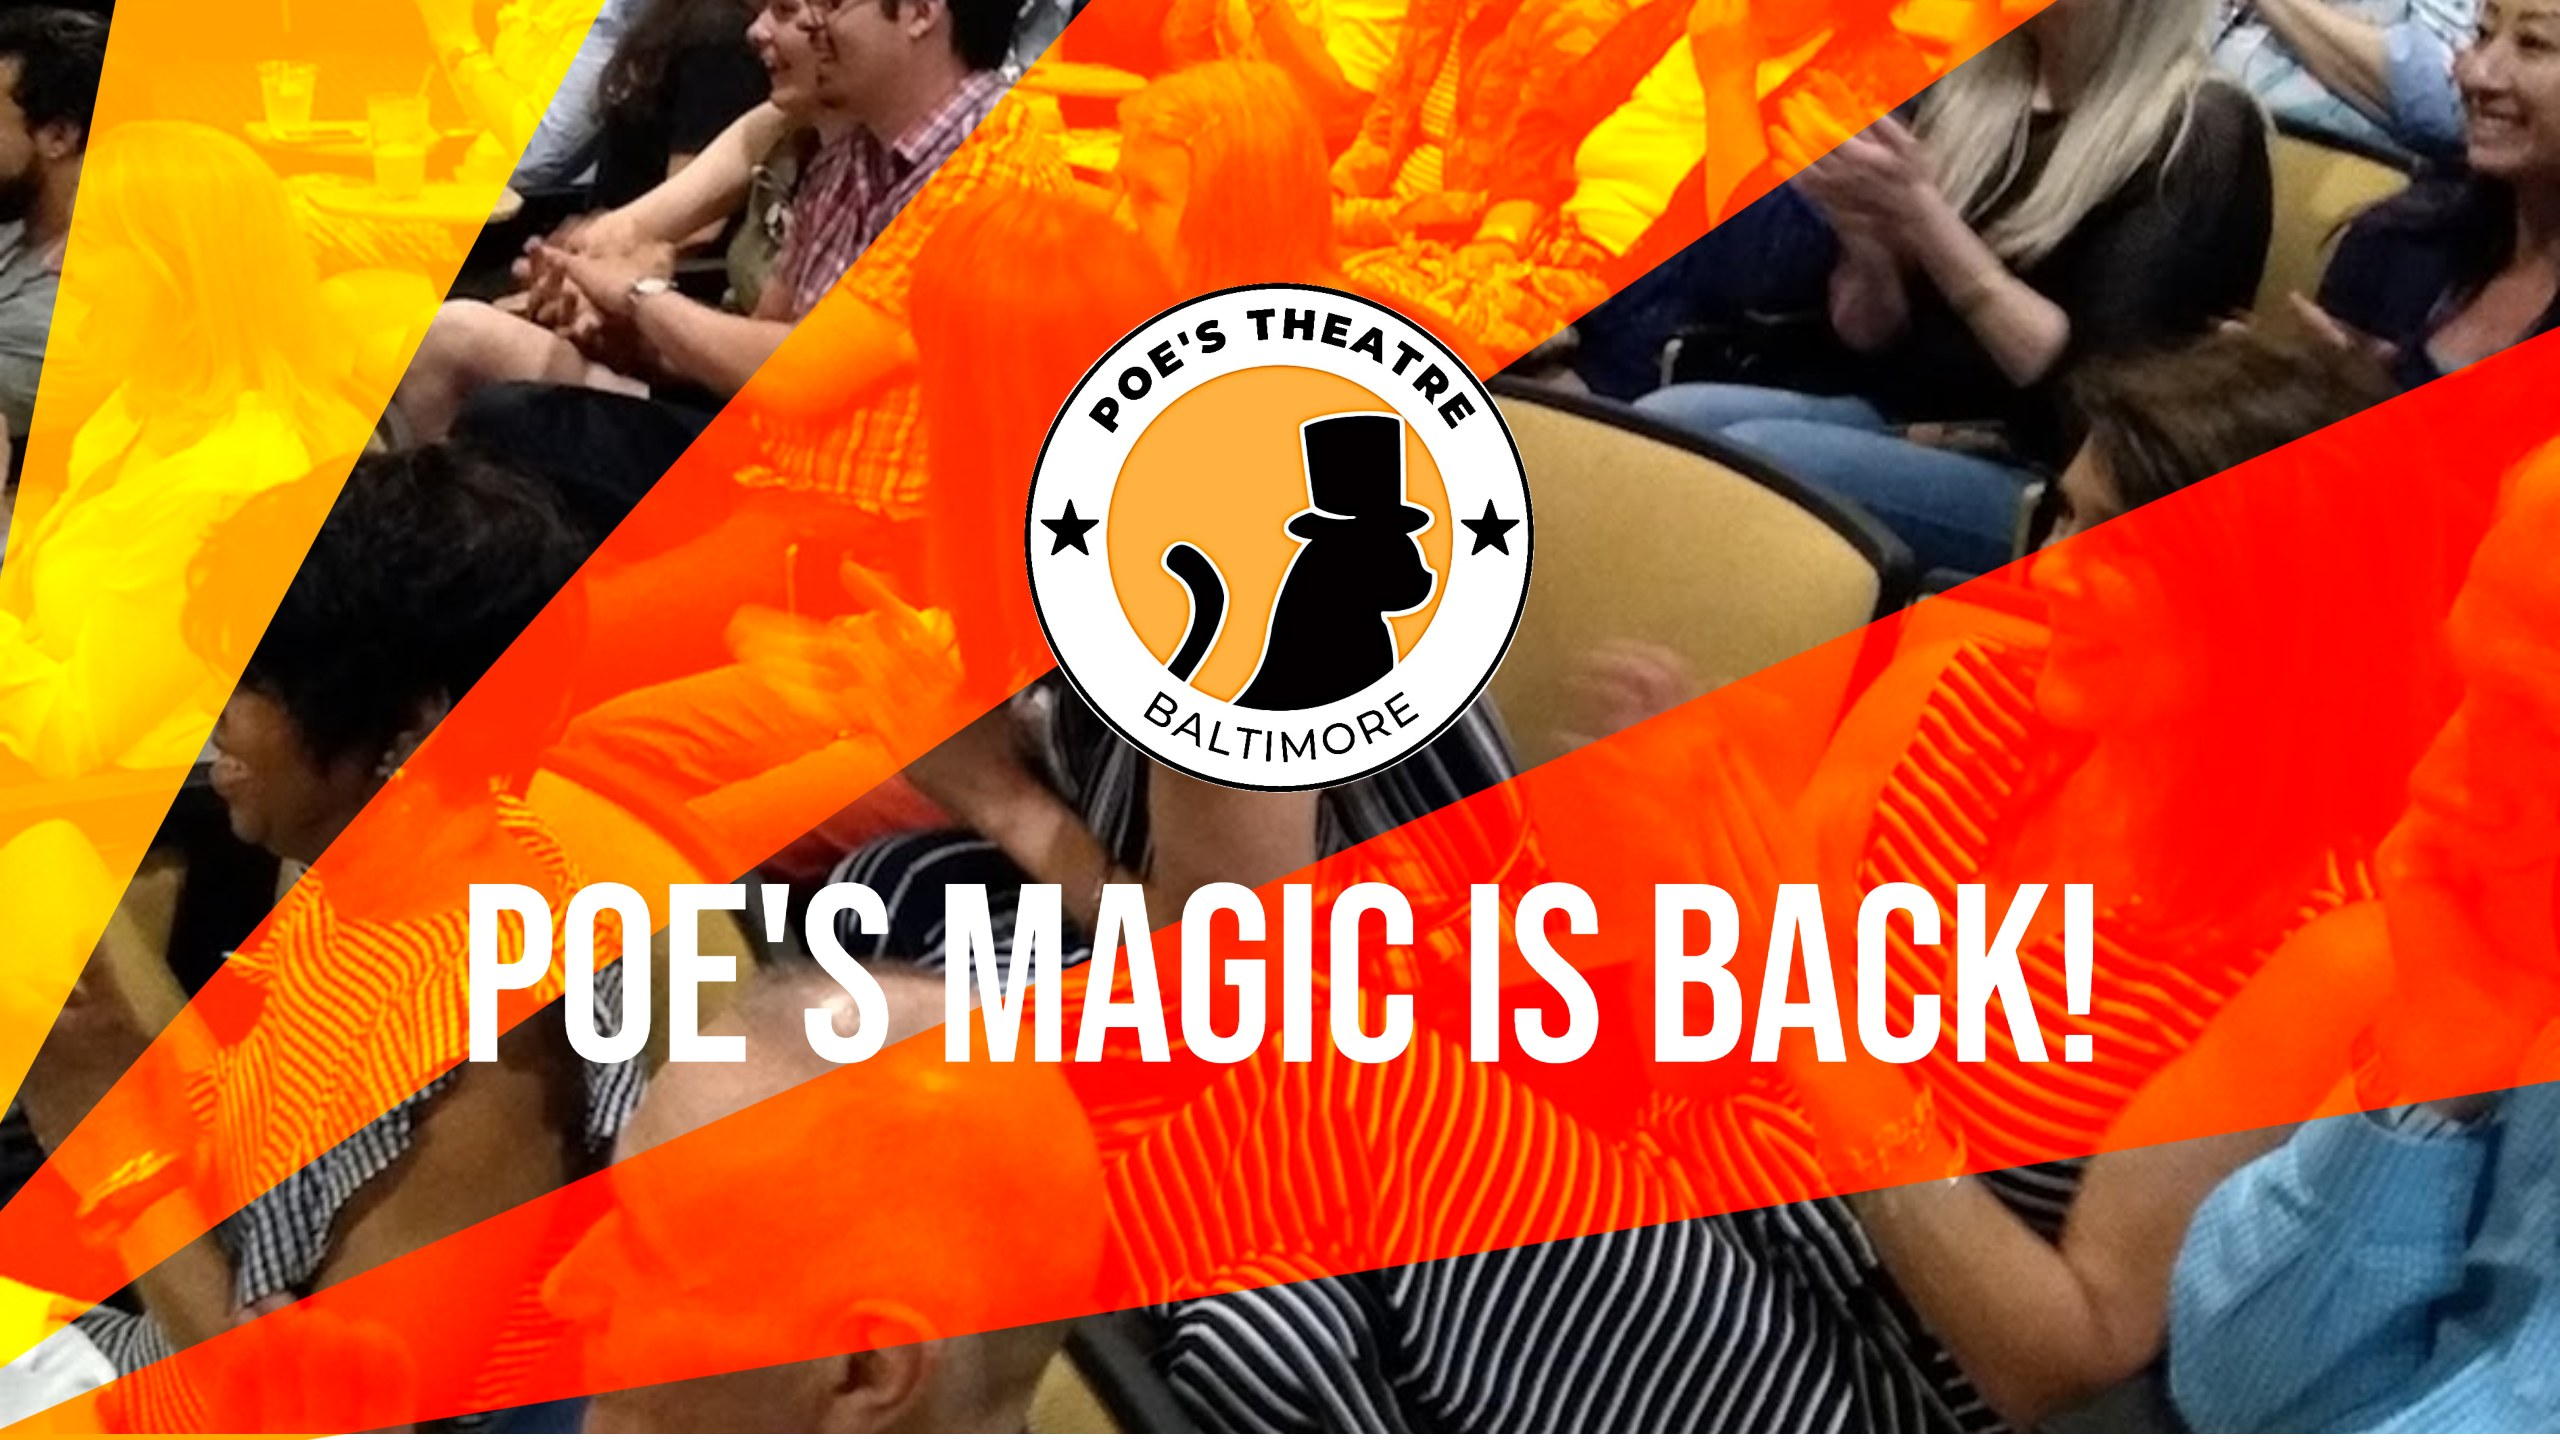 POE'S MAGIC IS BACK